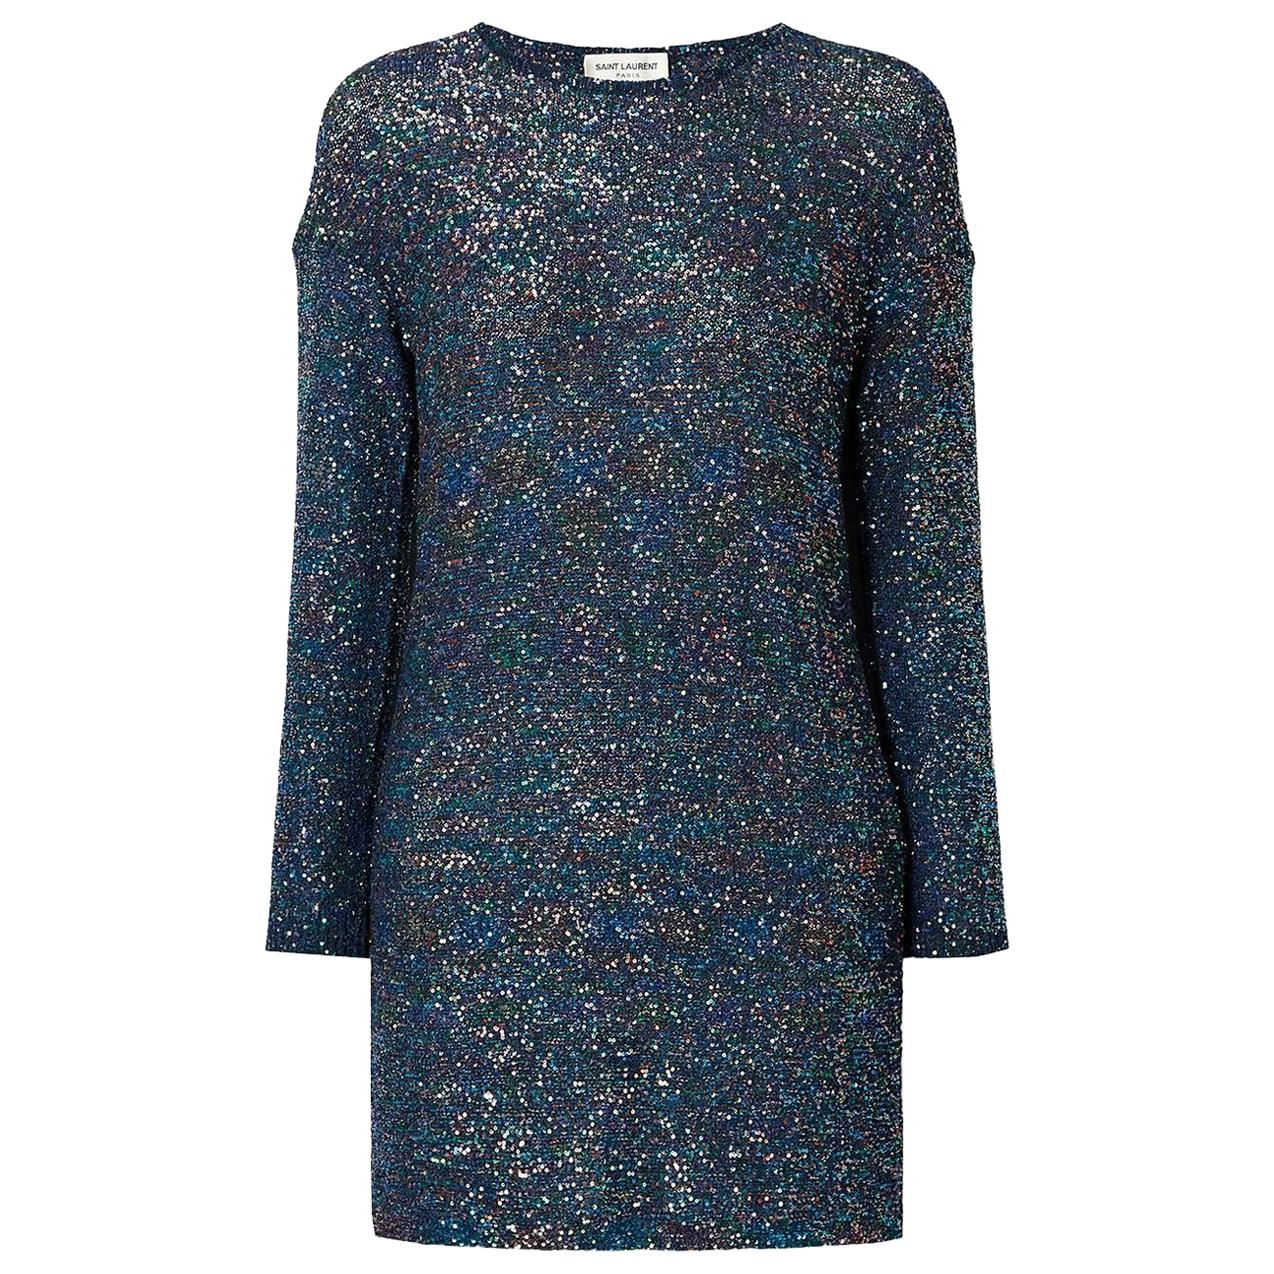 Saint Laurent Sequined Knitted Mini Dress